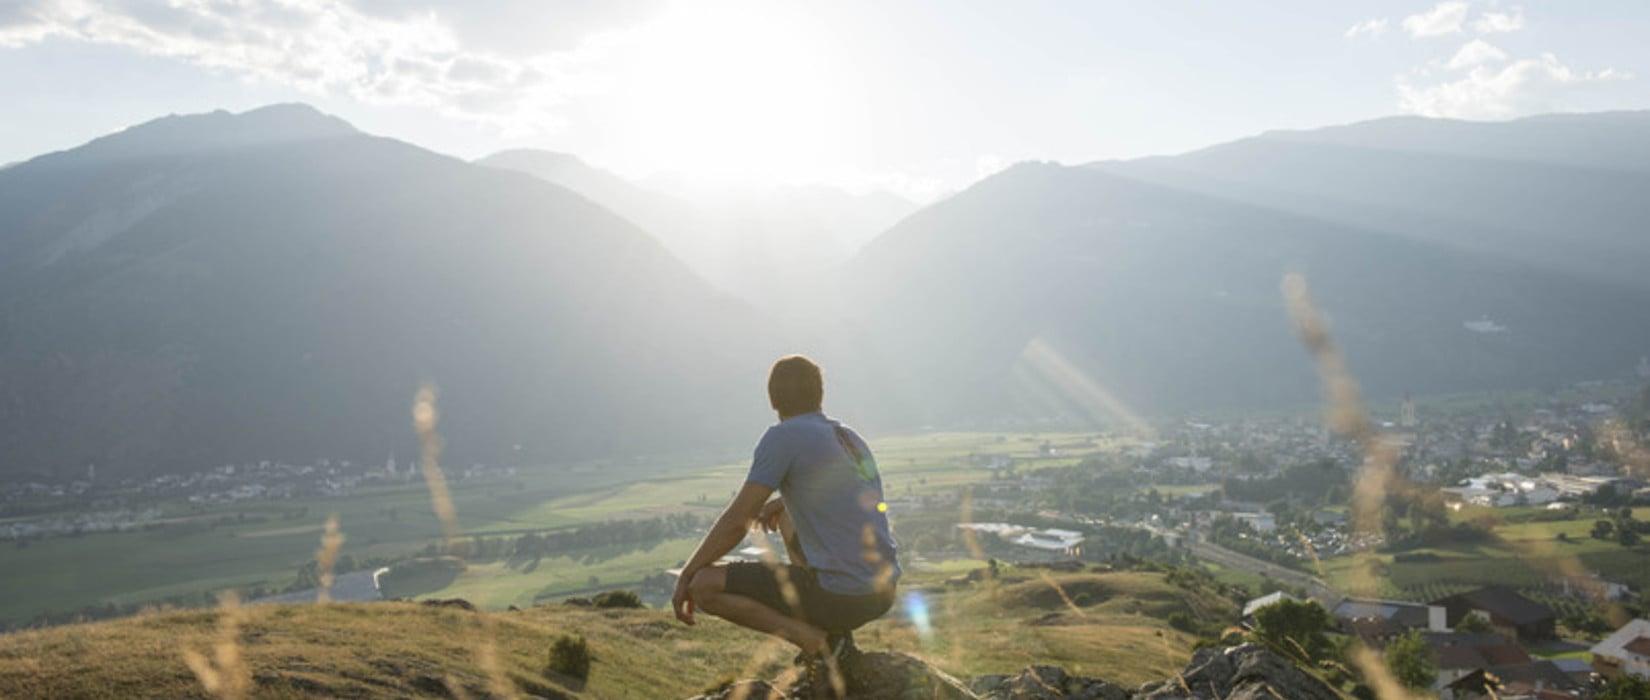 Den Südtiroler Herbst in all seinen Facetten erleben